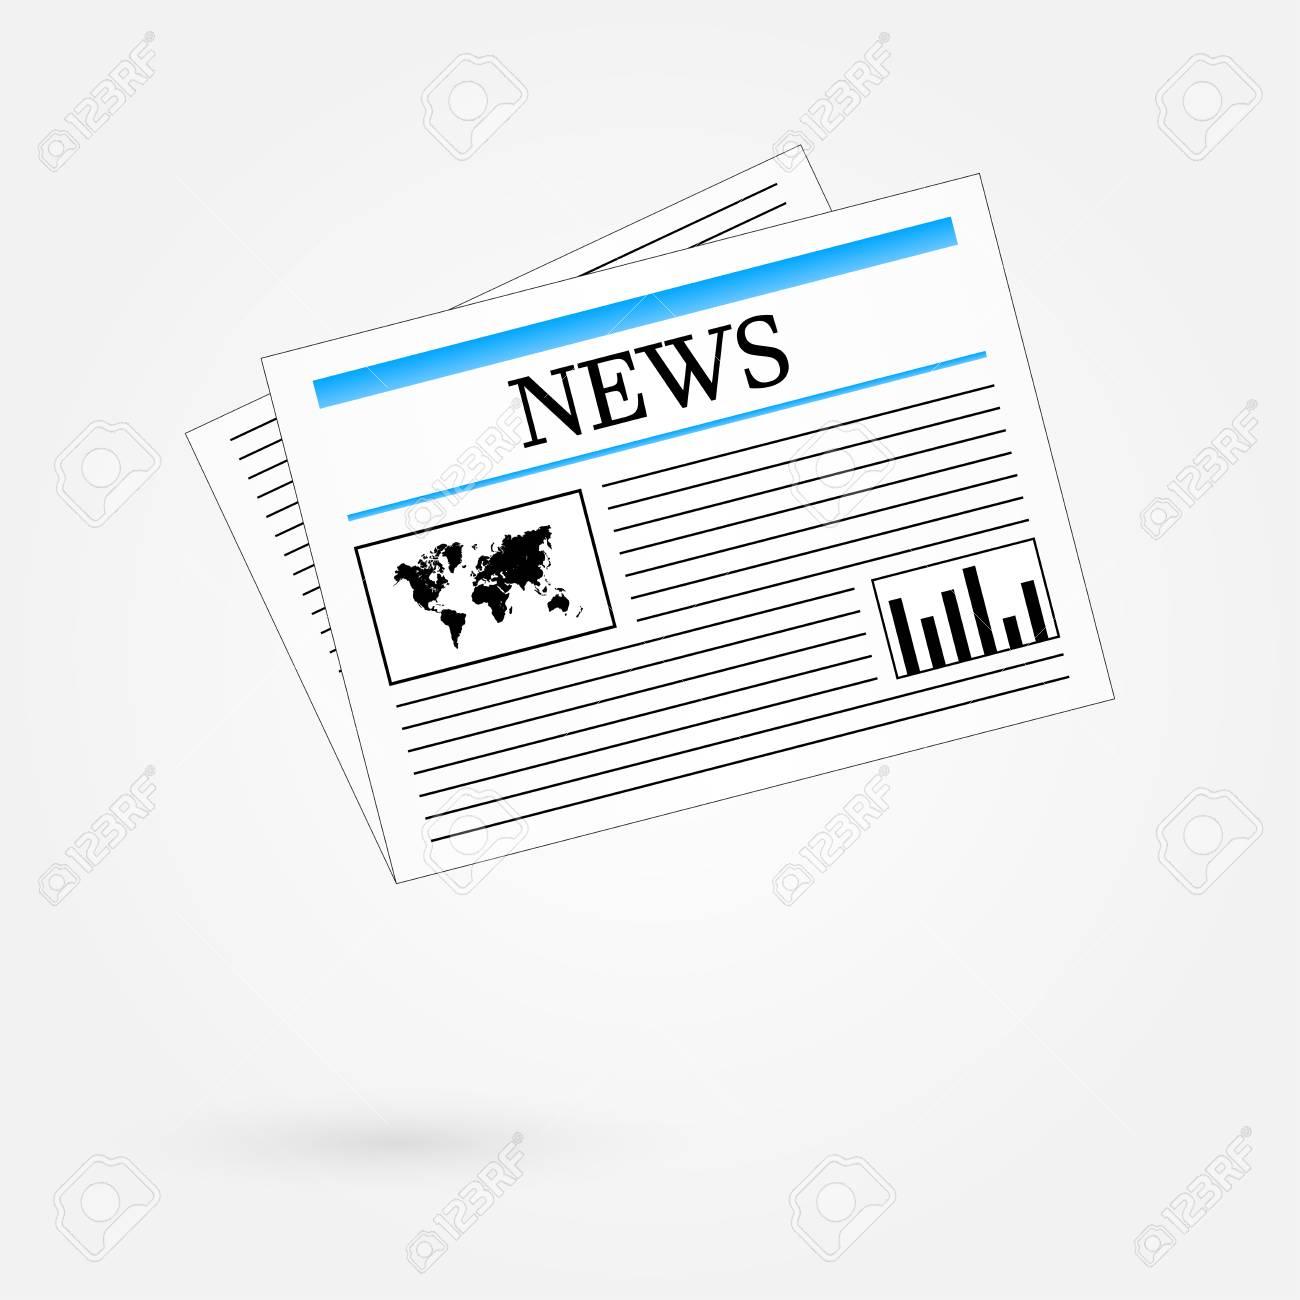 World News Newspaper Stock Vector - 24025328